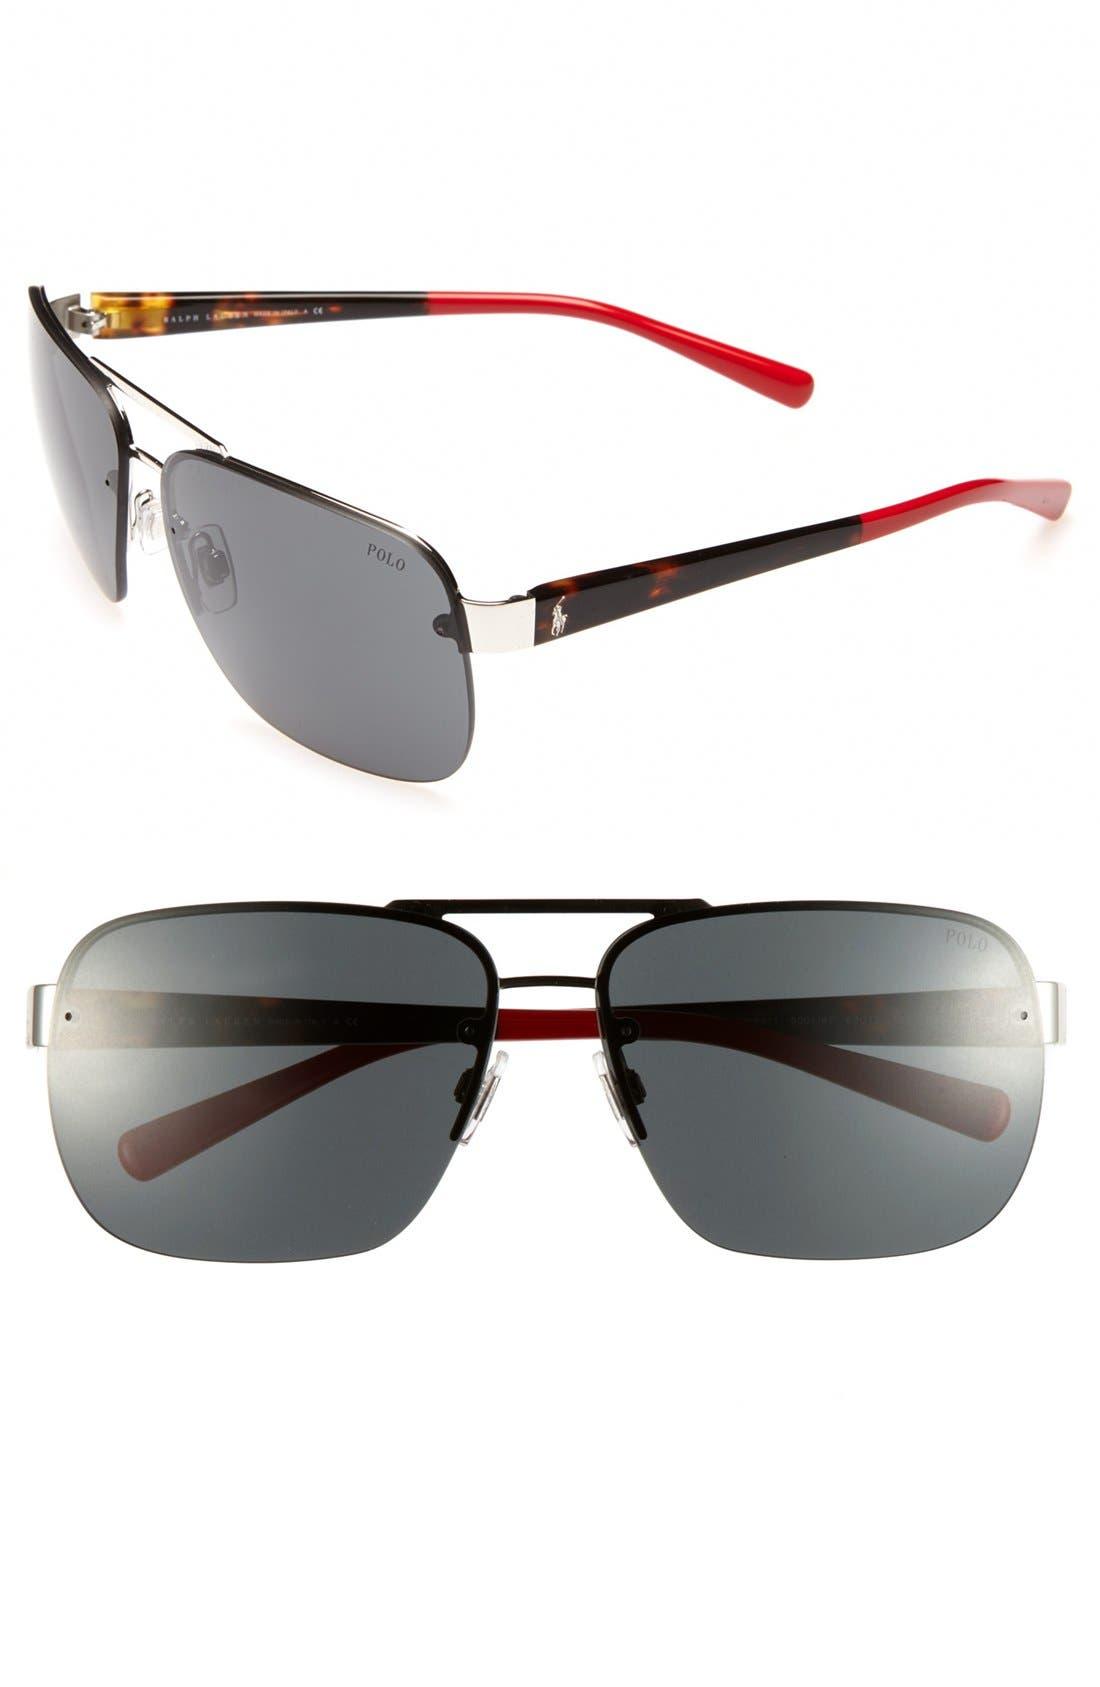 Alternate Image 1 Selected - Polo Ralph Lauren 'Color End' 62mm Sunglasses